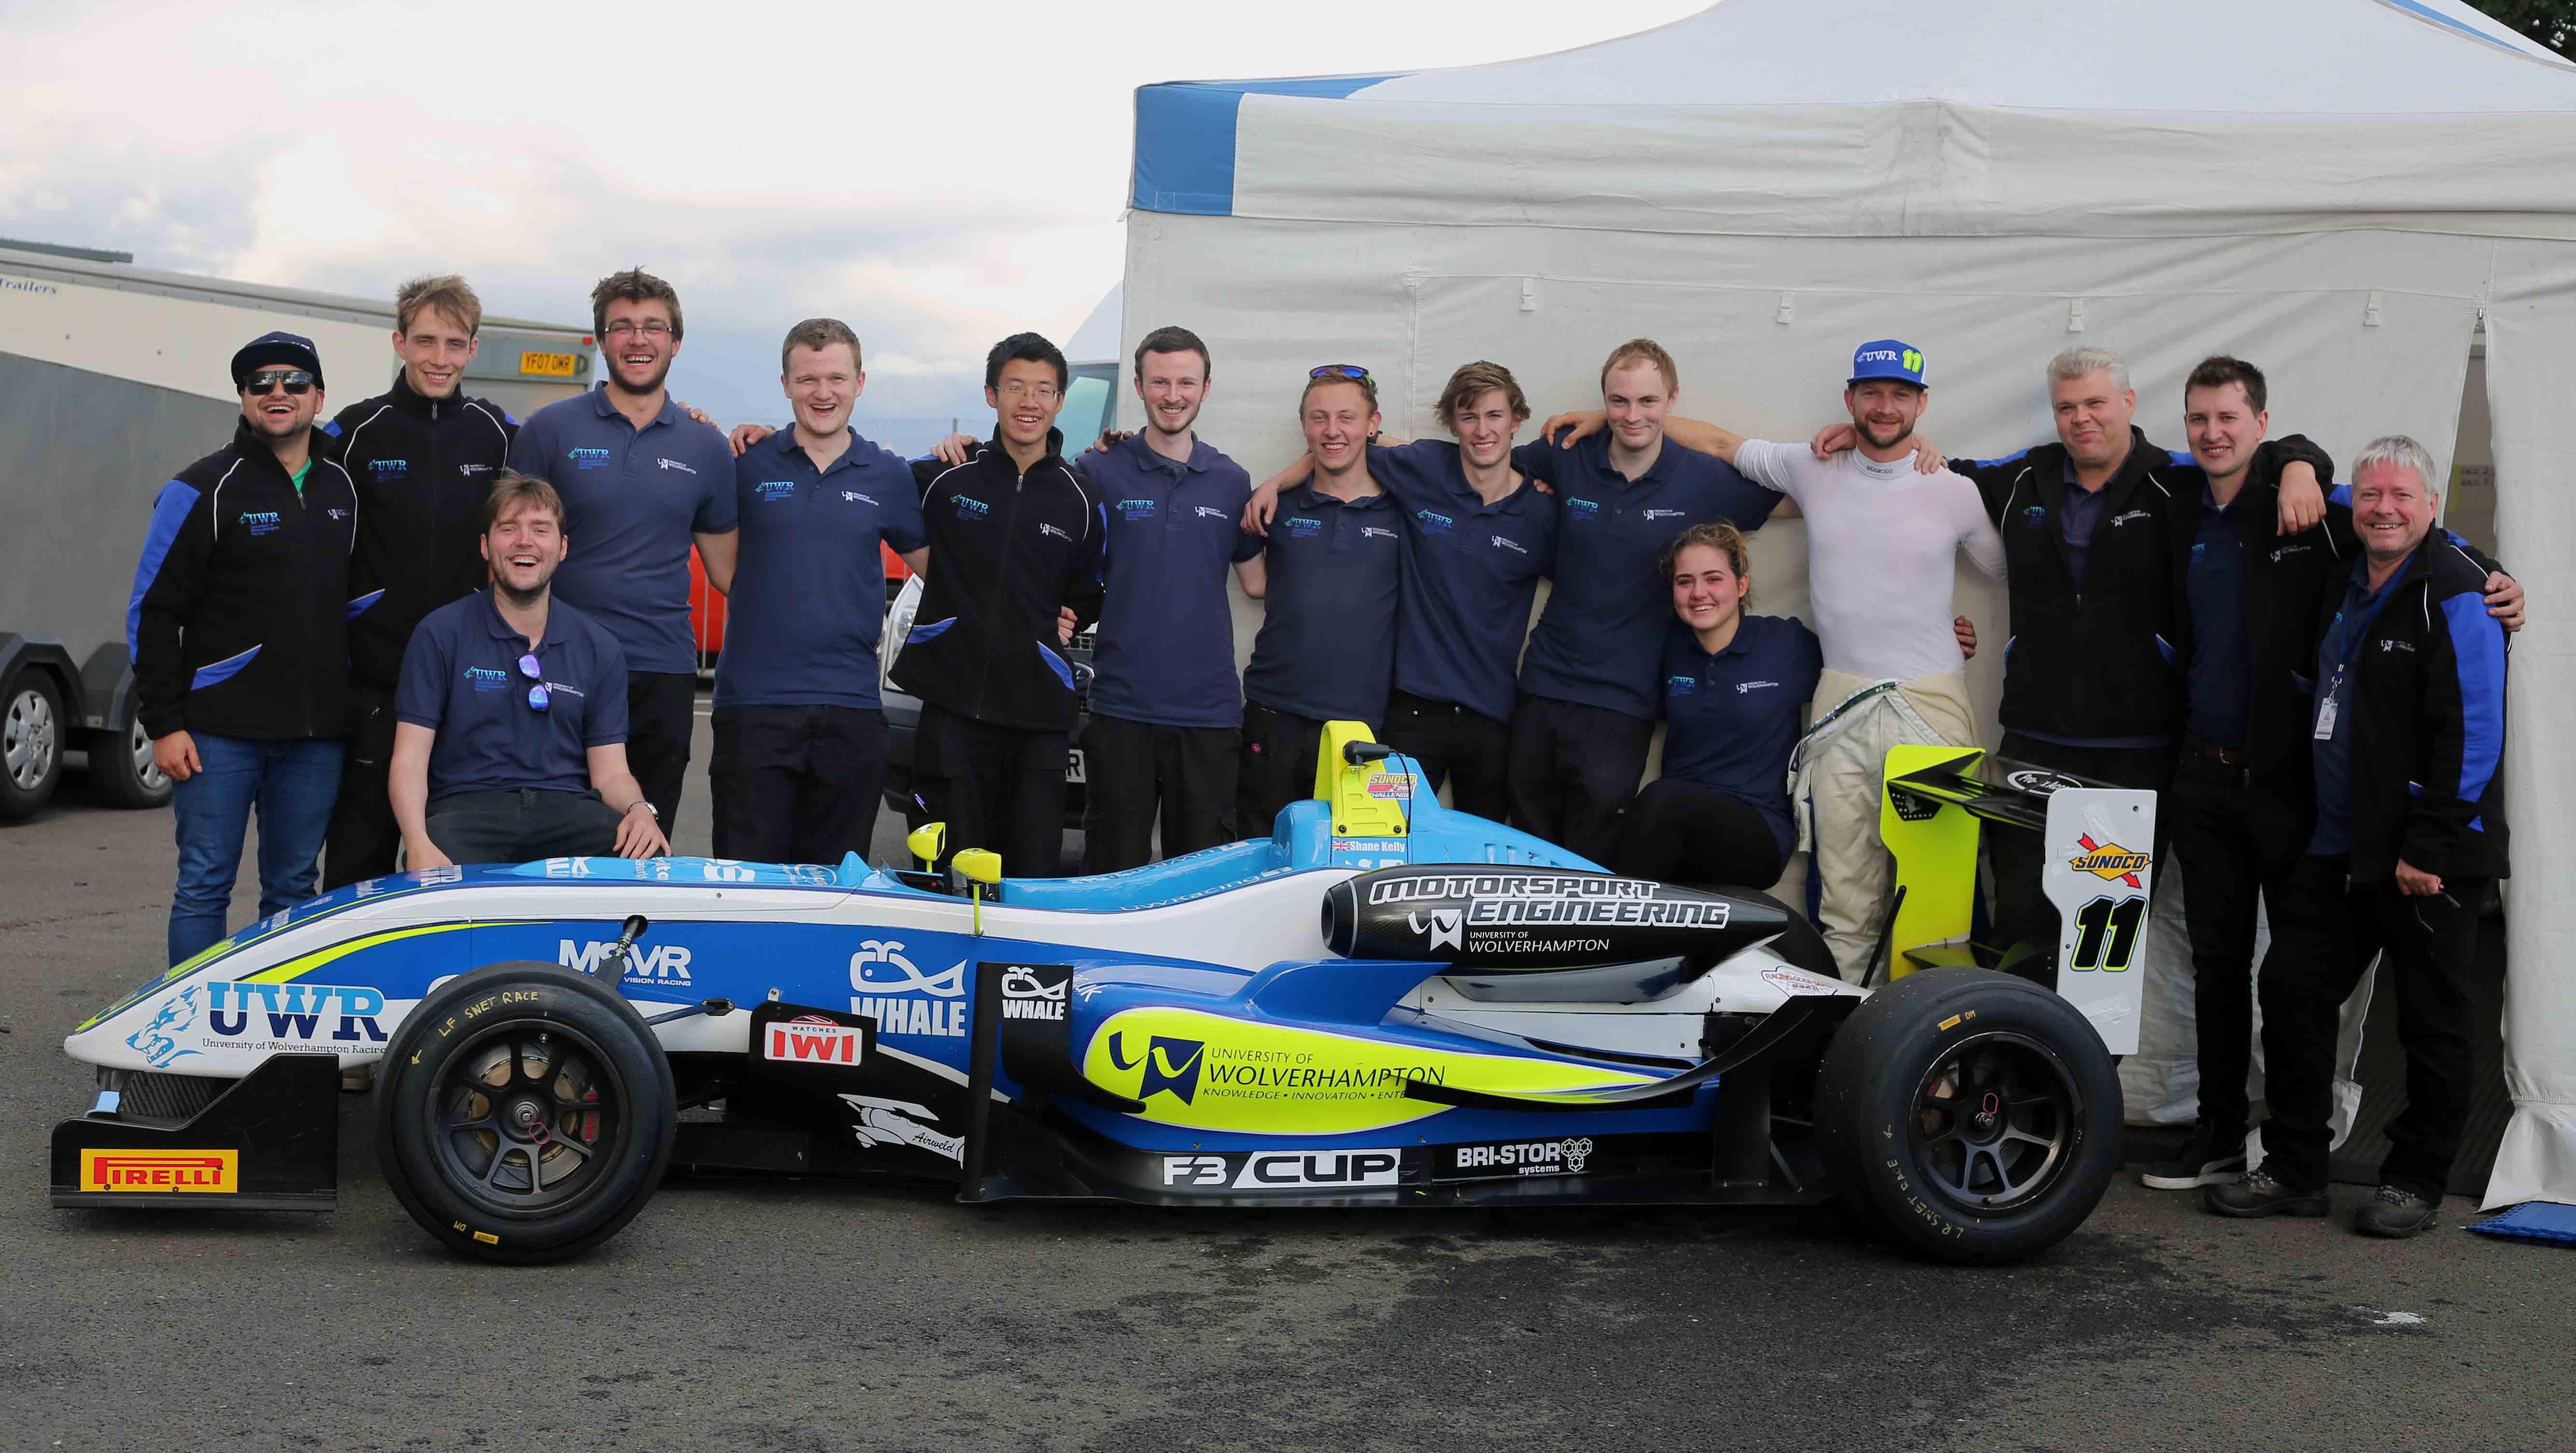 UWR F3 Team Snetterton